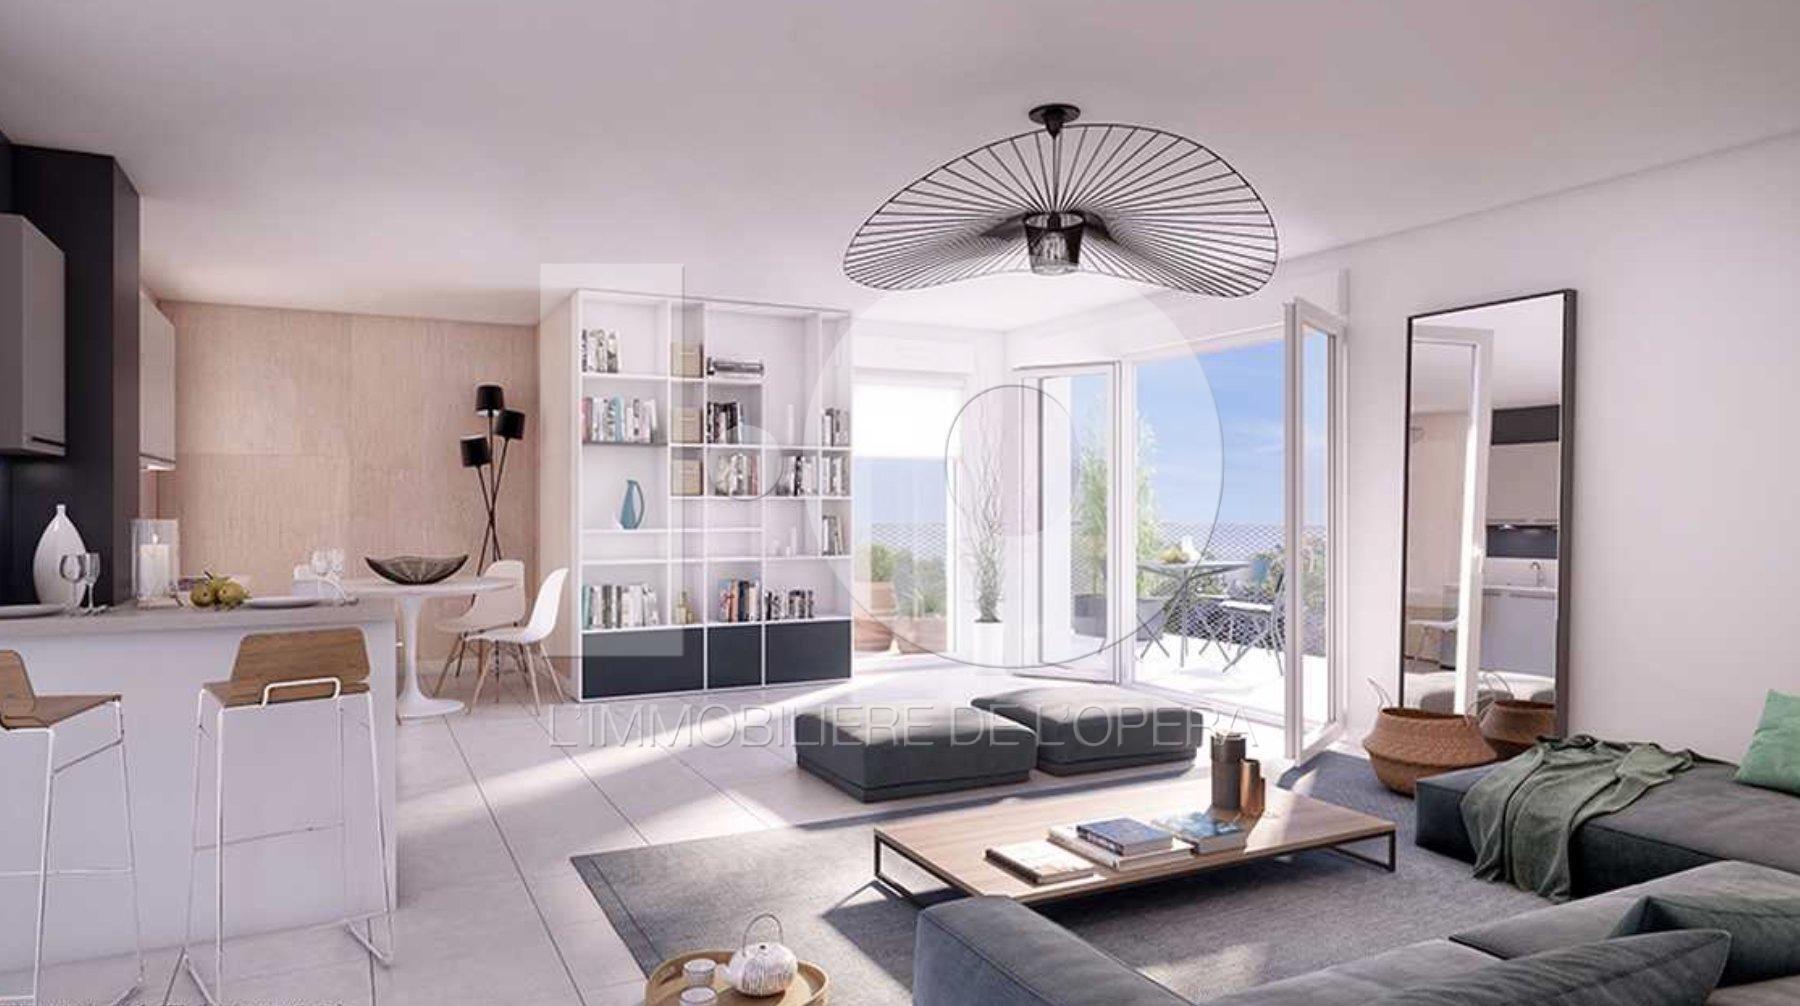 CAGNES S/ MER - Appartement 5 Pièces 112 m2, Terrasse 38 m2,